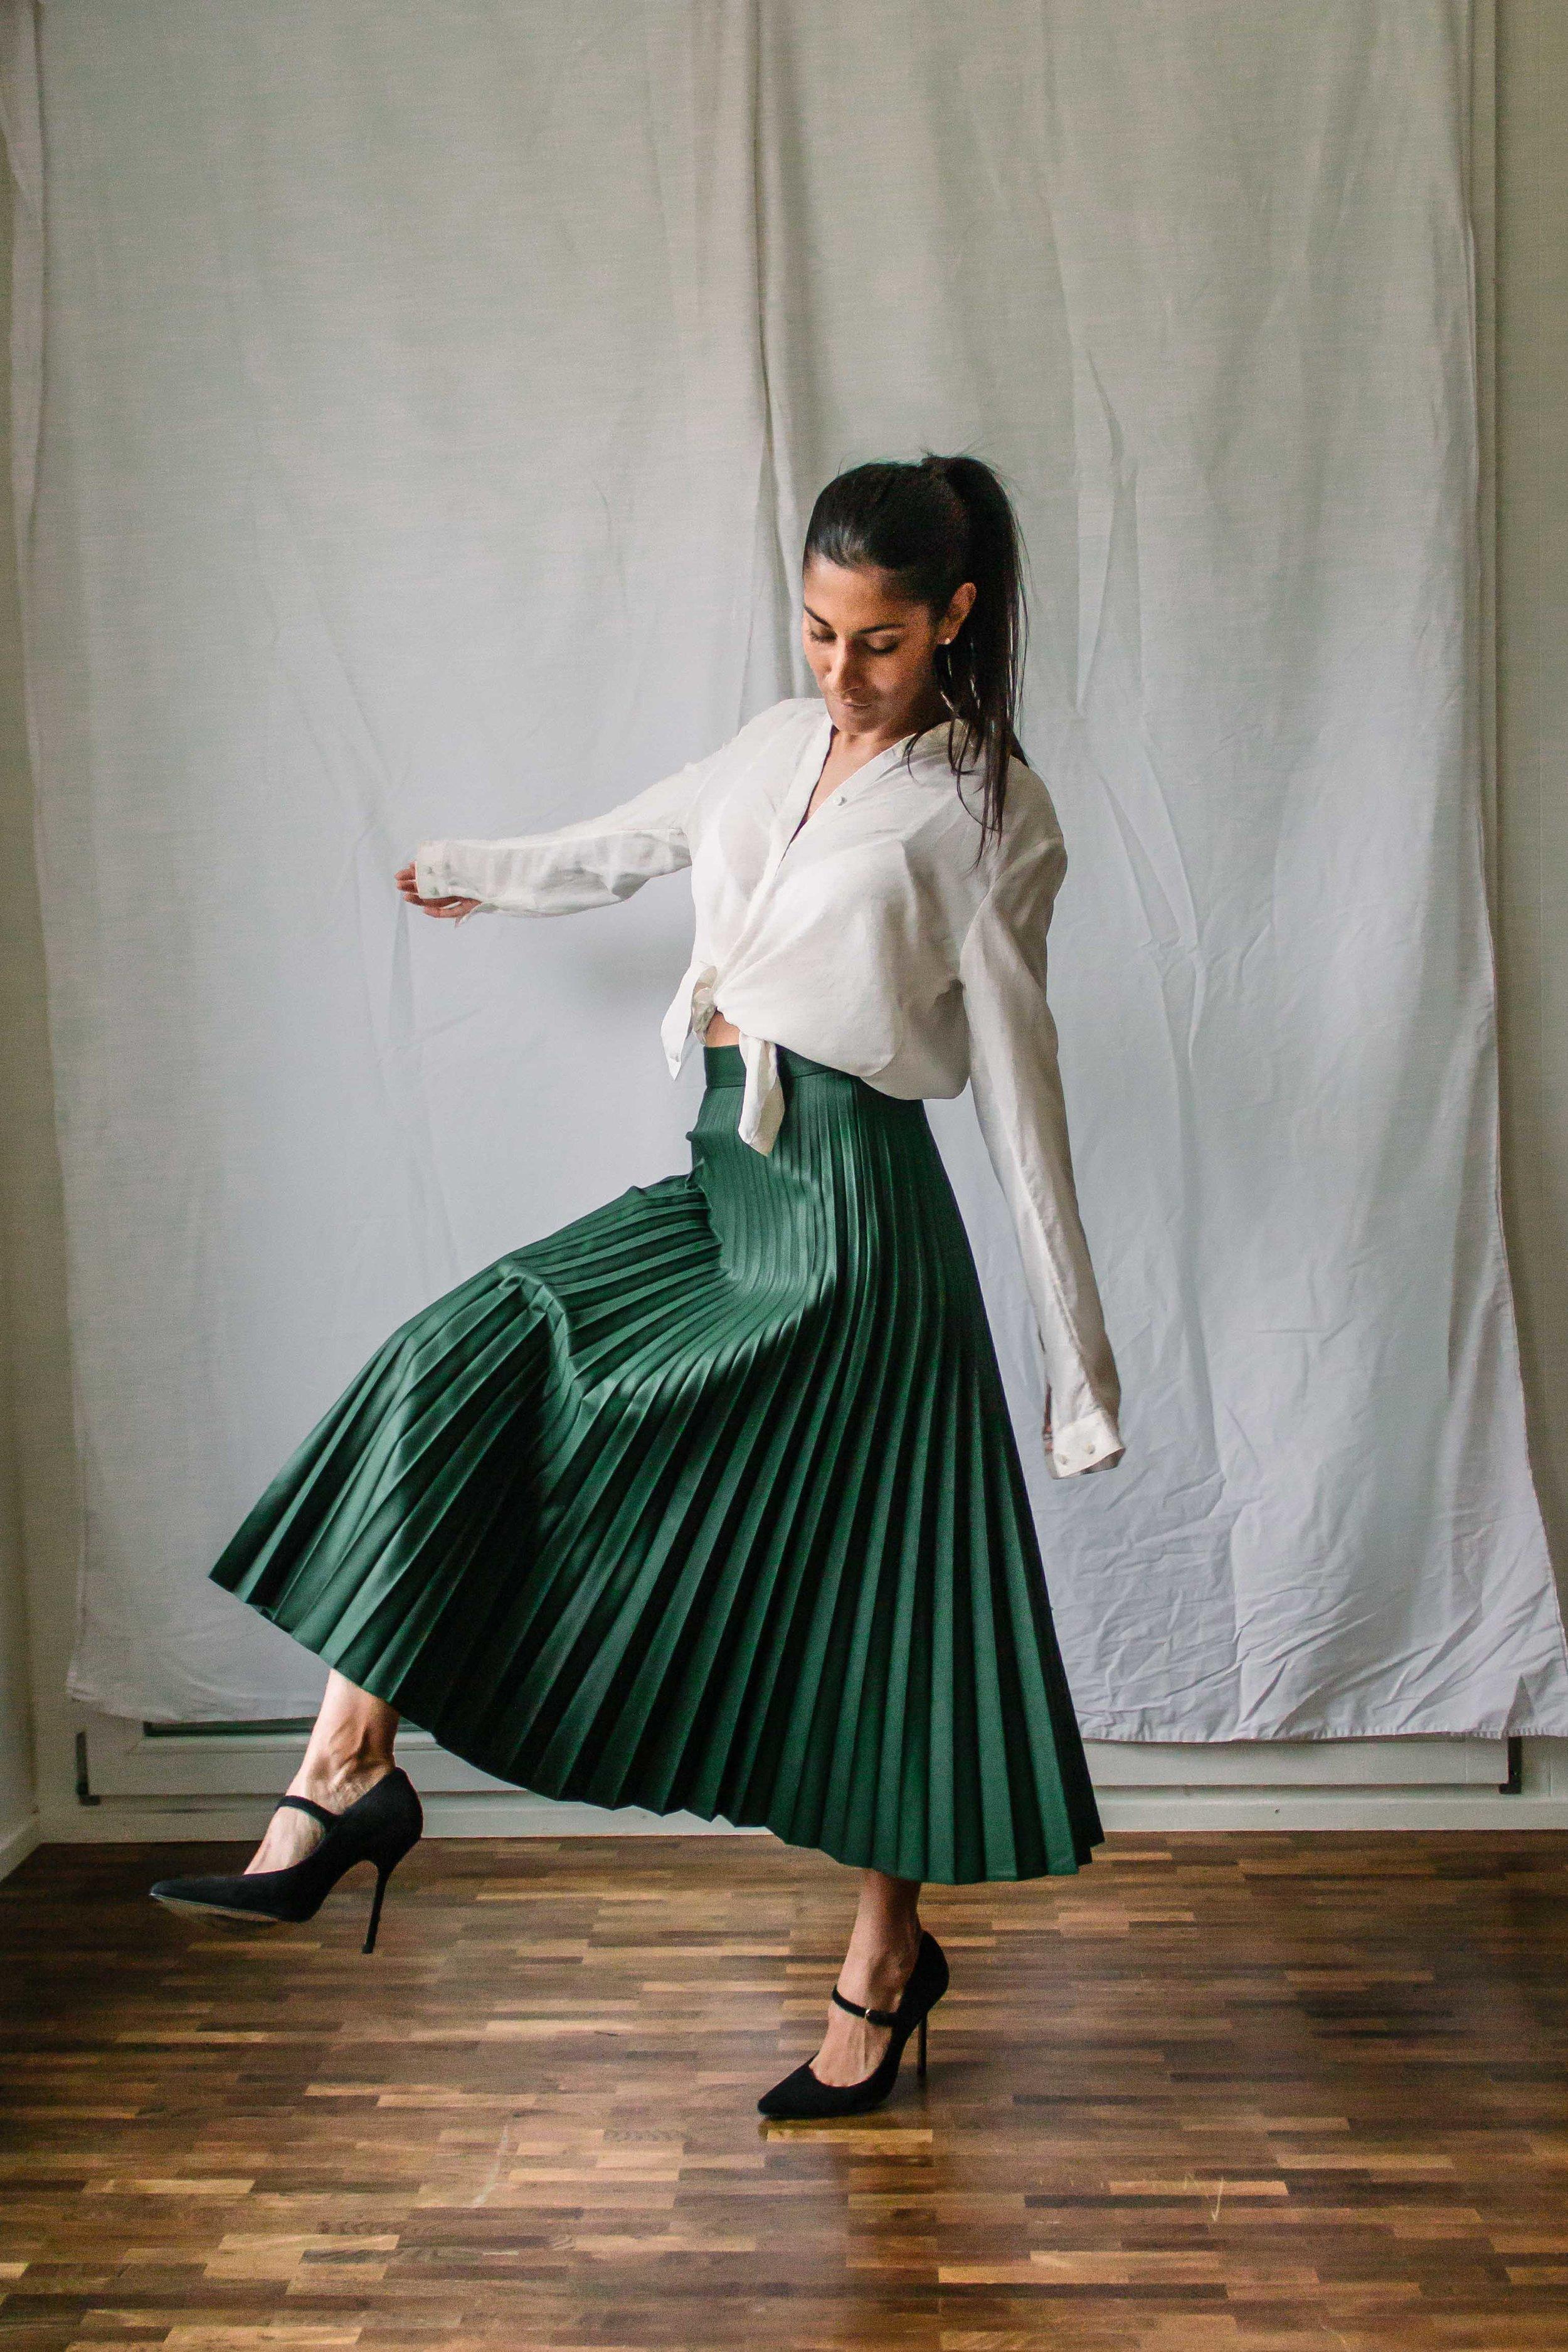 CHIC, ELEGANT, SENSUOUS. Blouse: &Other Stories (similar    here   ); skirt: Zara; shoes: Buffalo London